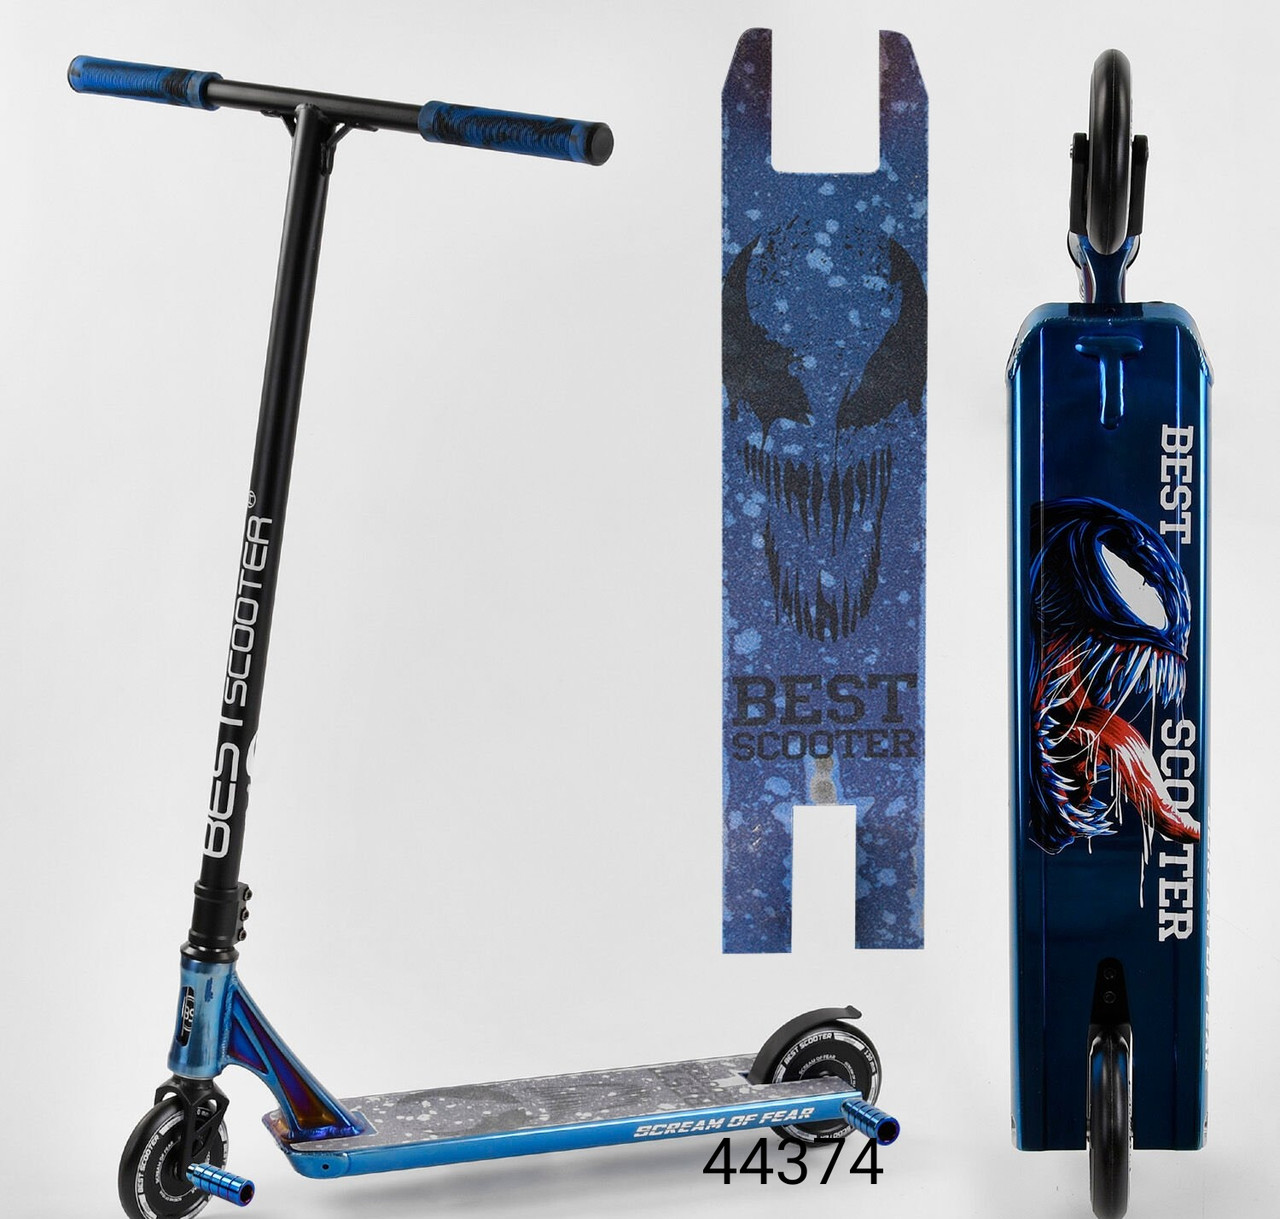 Самокат трюковий 44374 Best Scooter синій SIMBIOTE